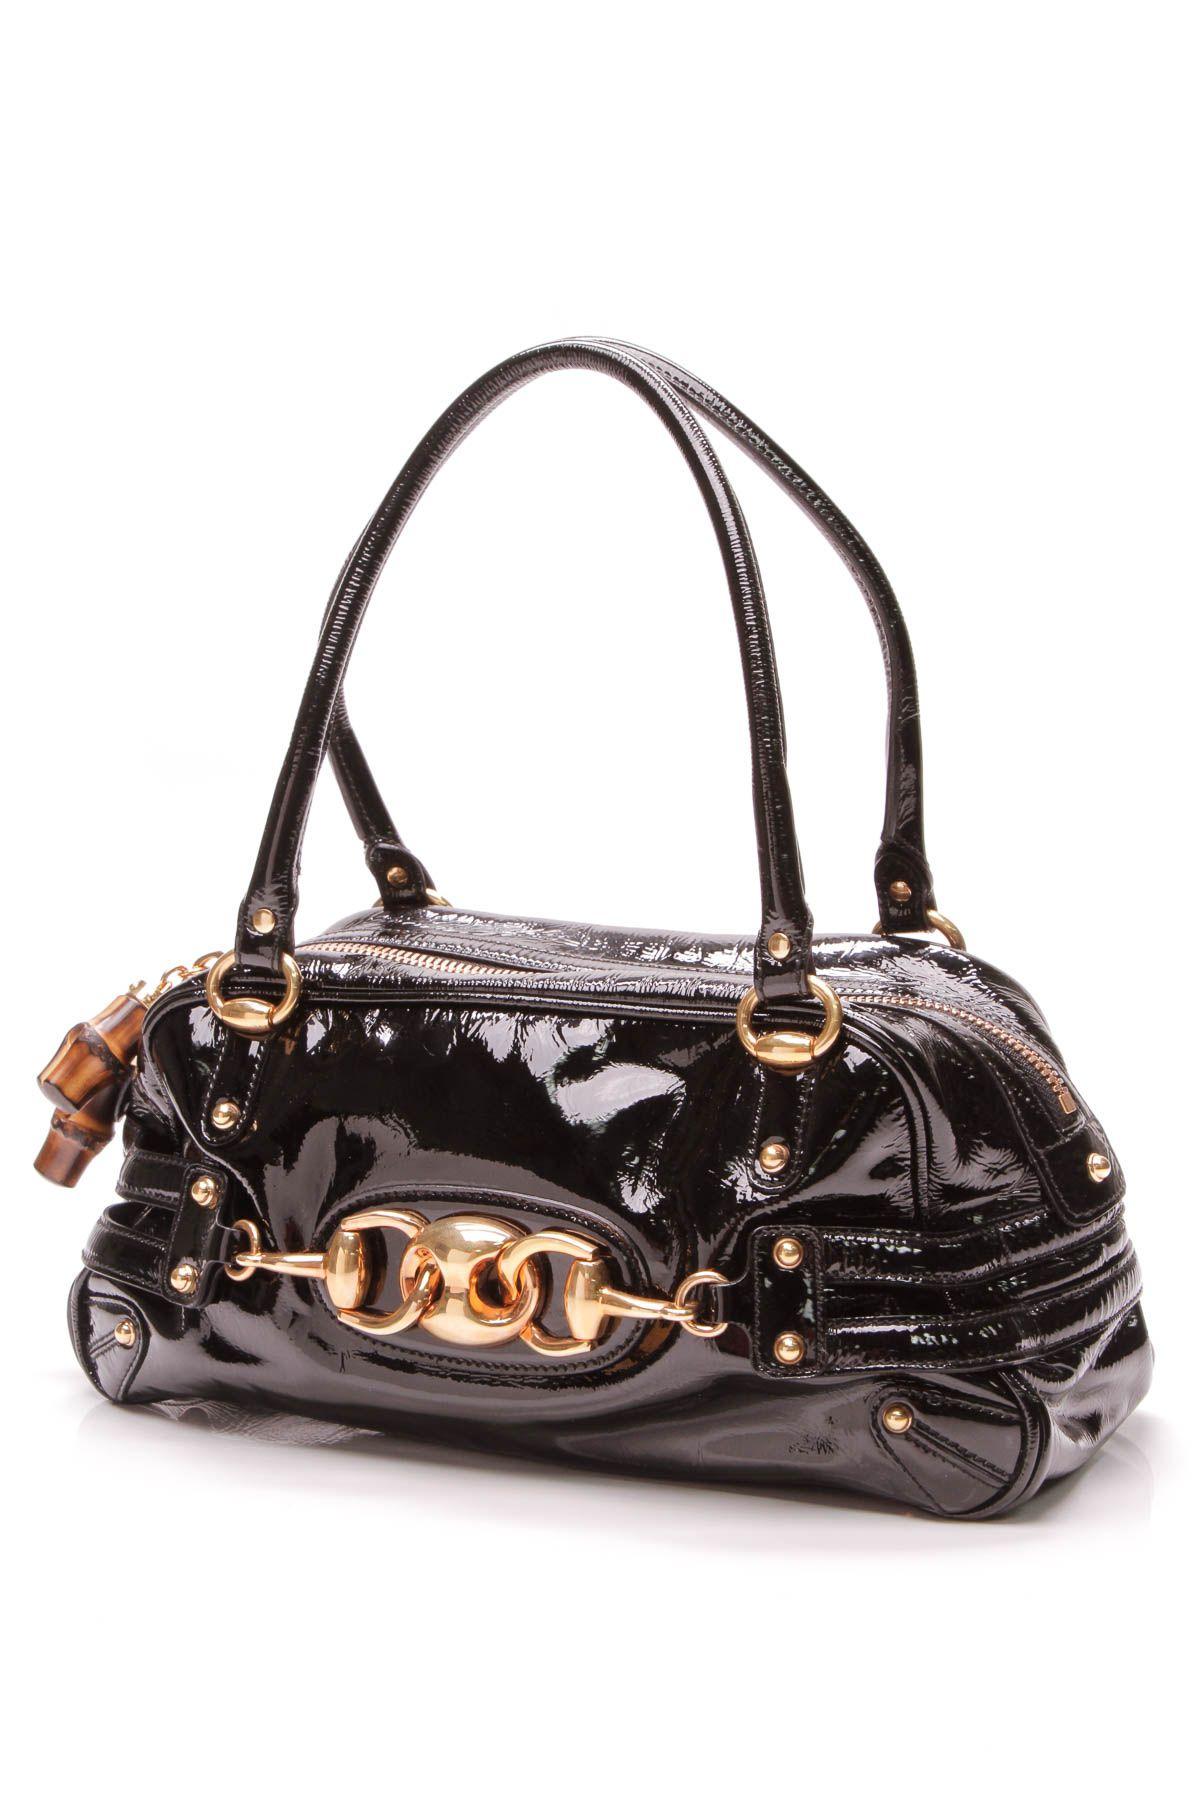 e479a6f3dff Wave Boston Bag - Black Patent Leather in 2019